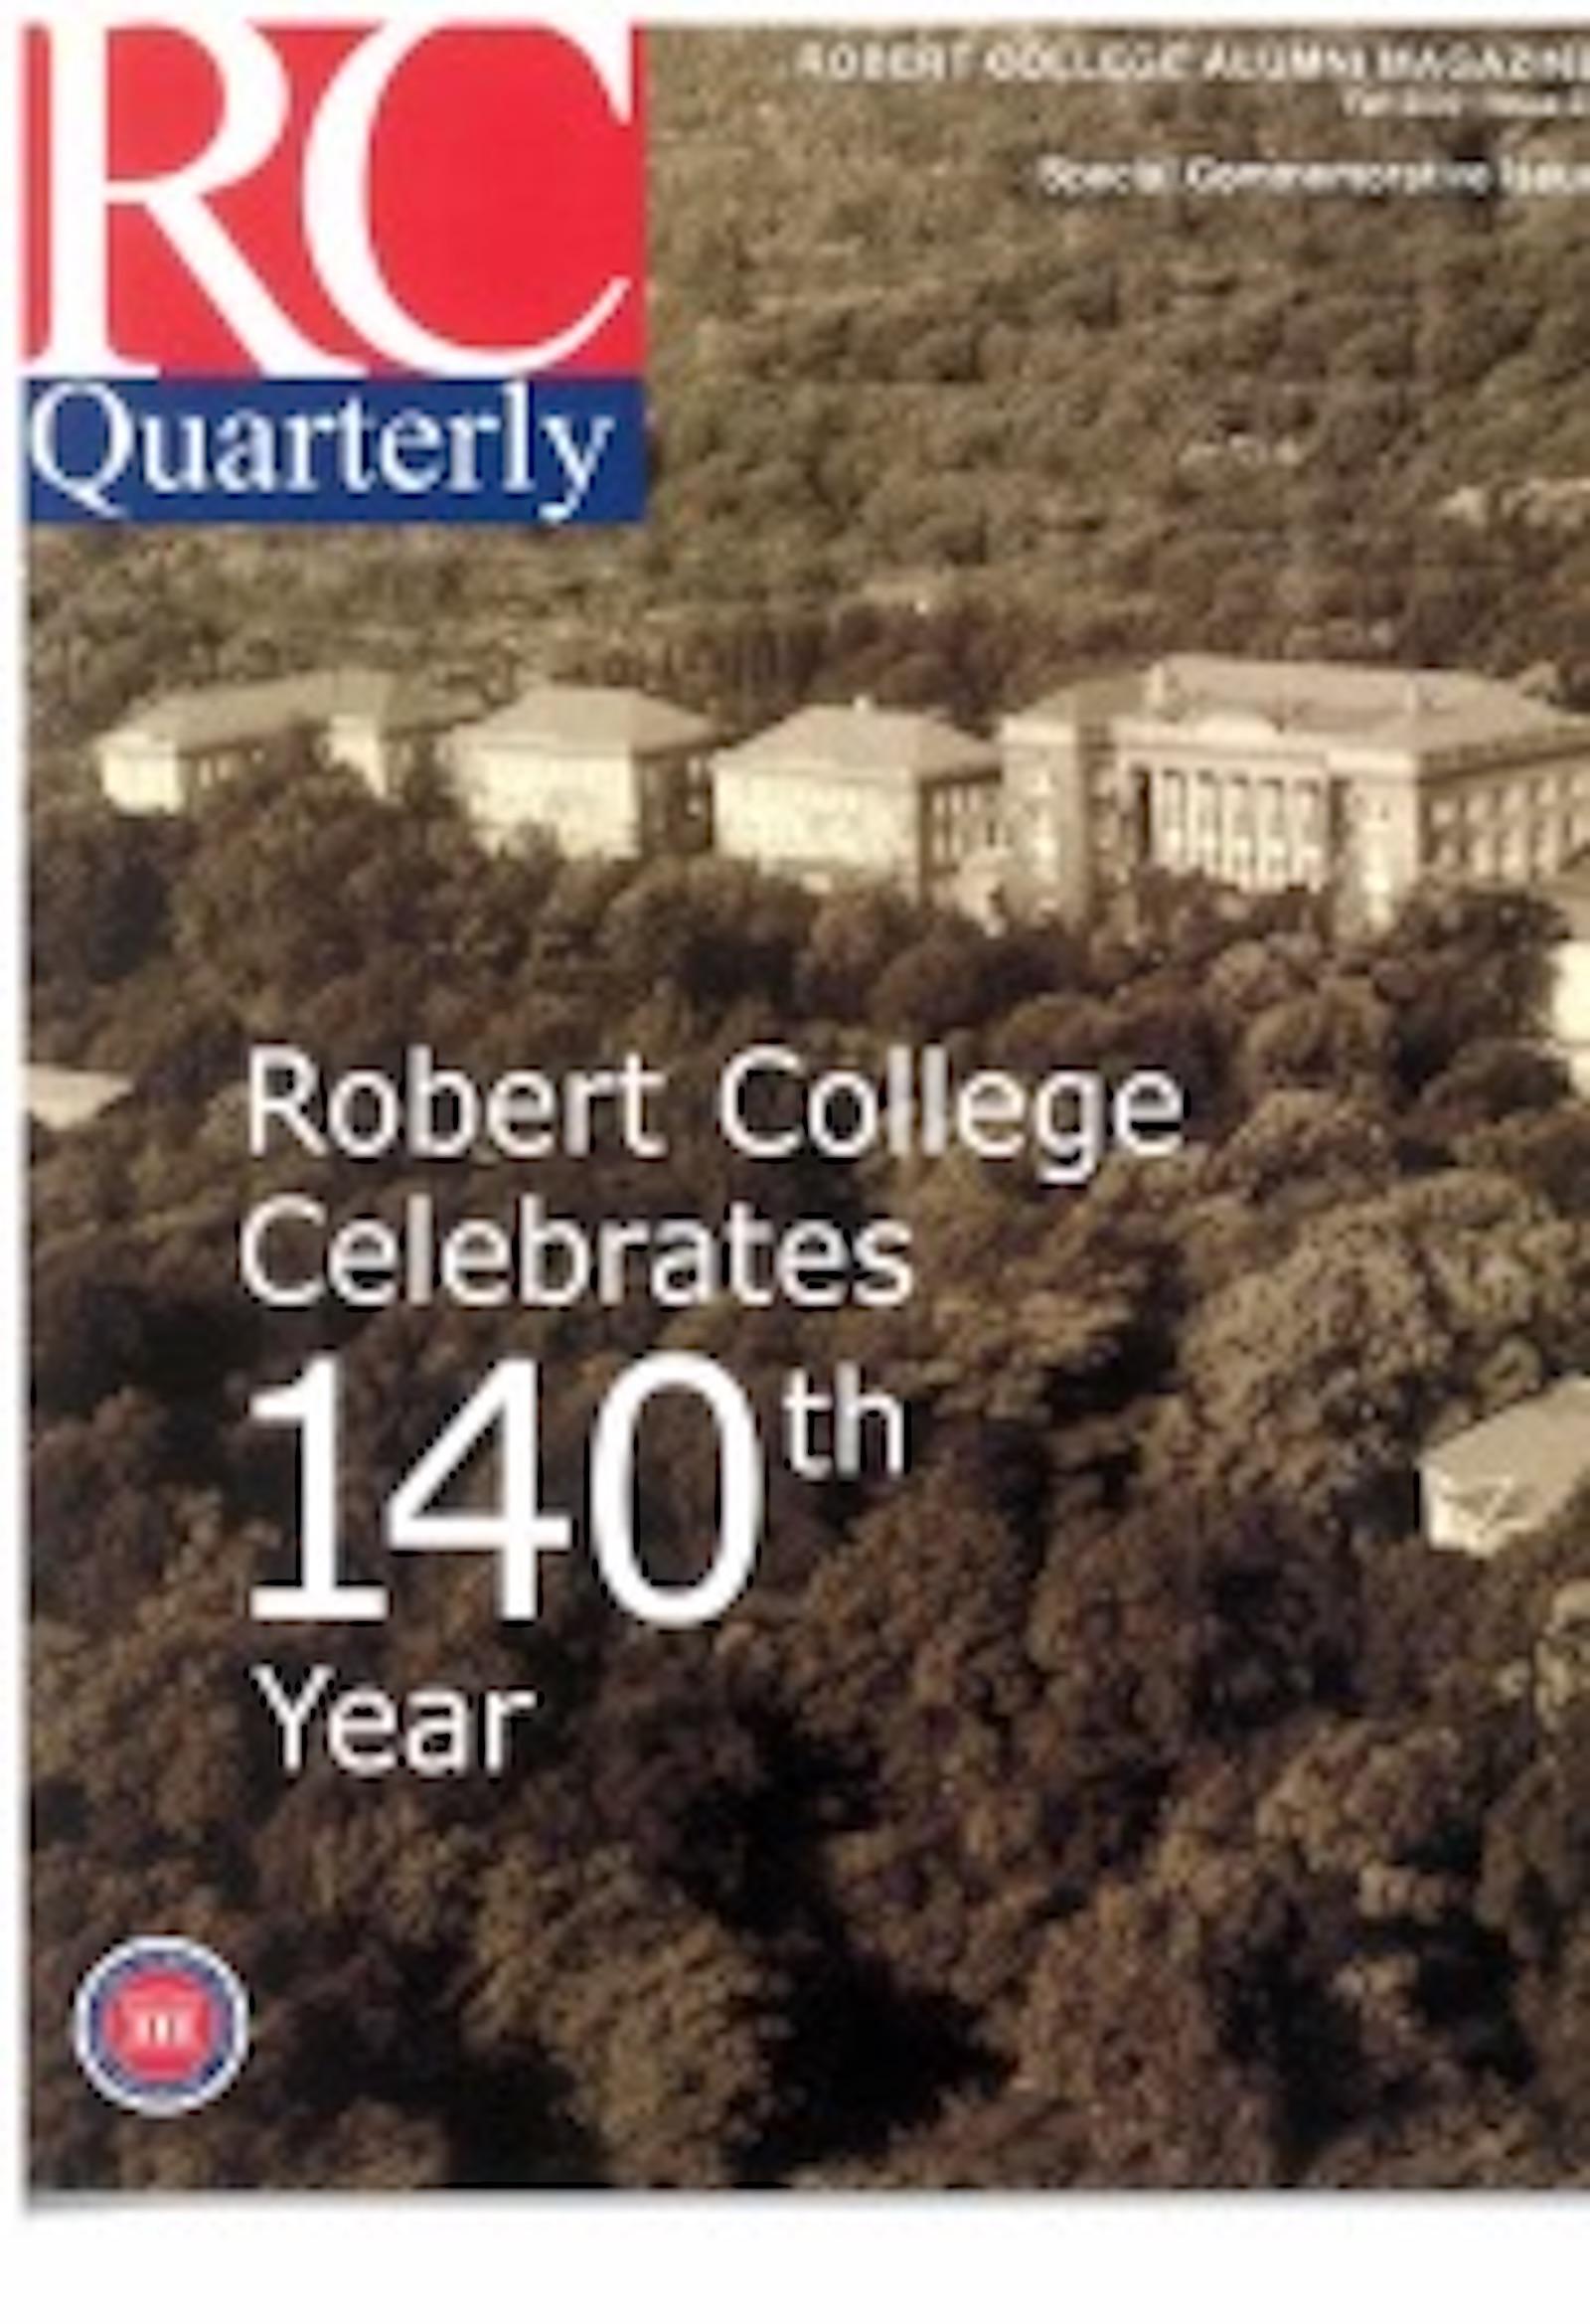 robert college celebrates